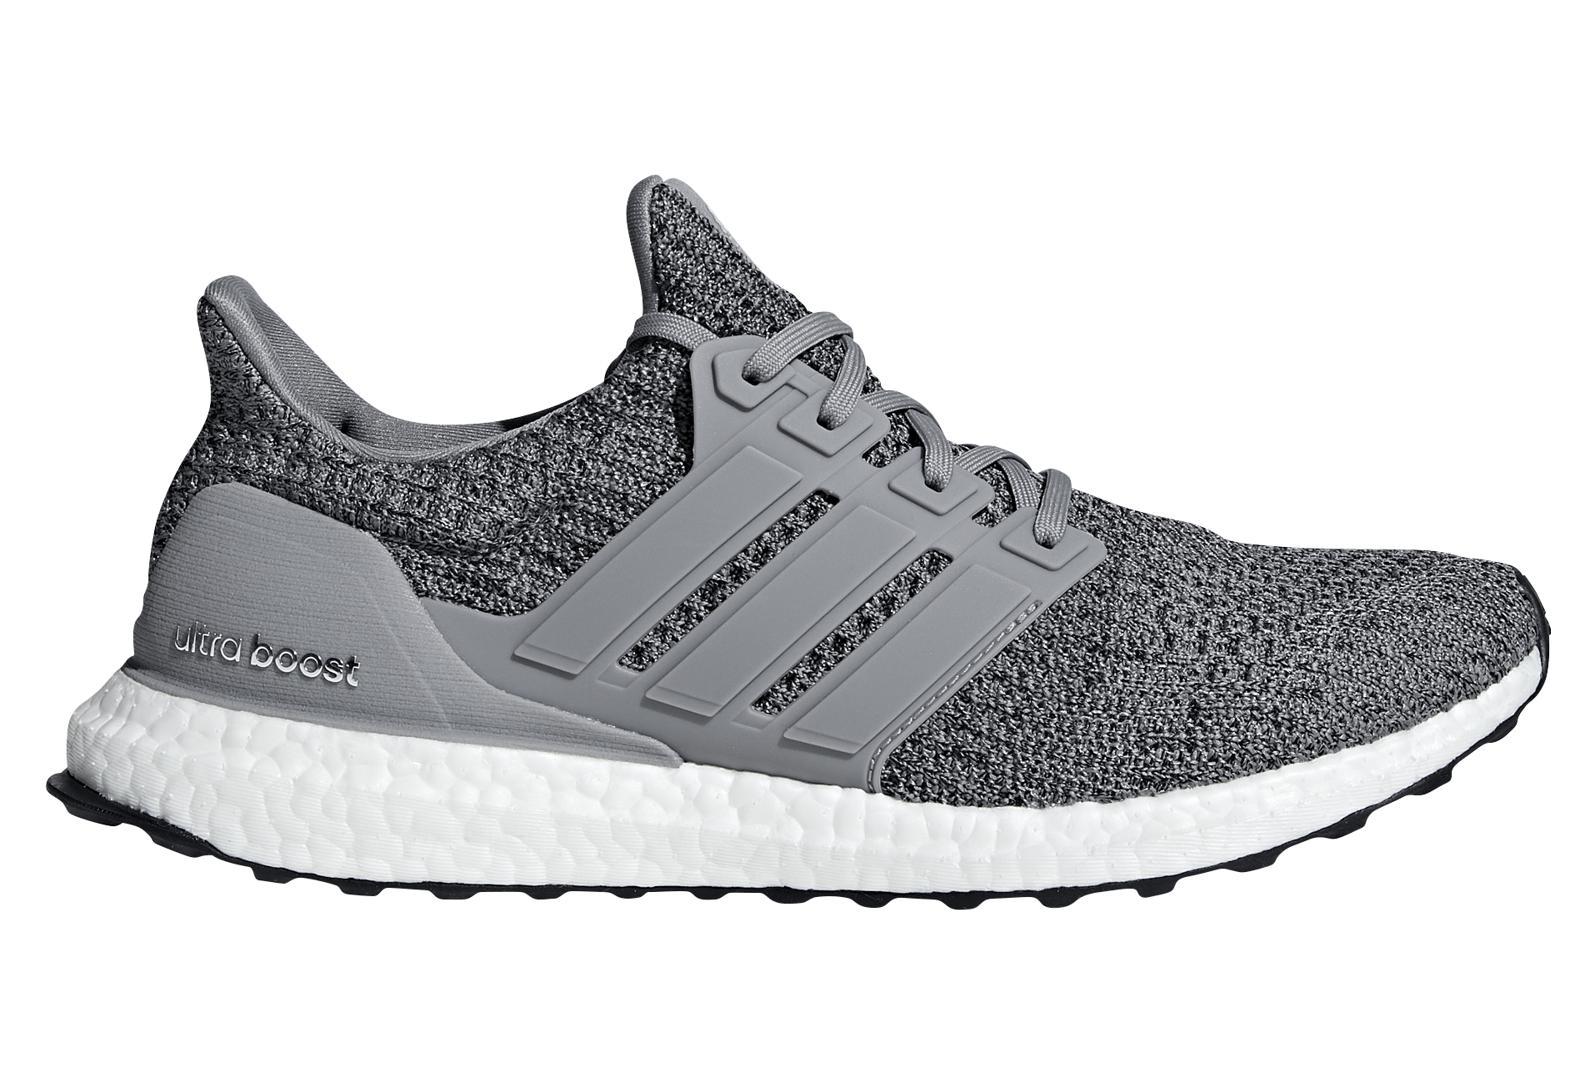 newest b09bf 953d4 Adidas UltraBOOST Schuhe Grau